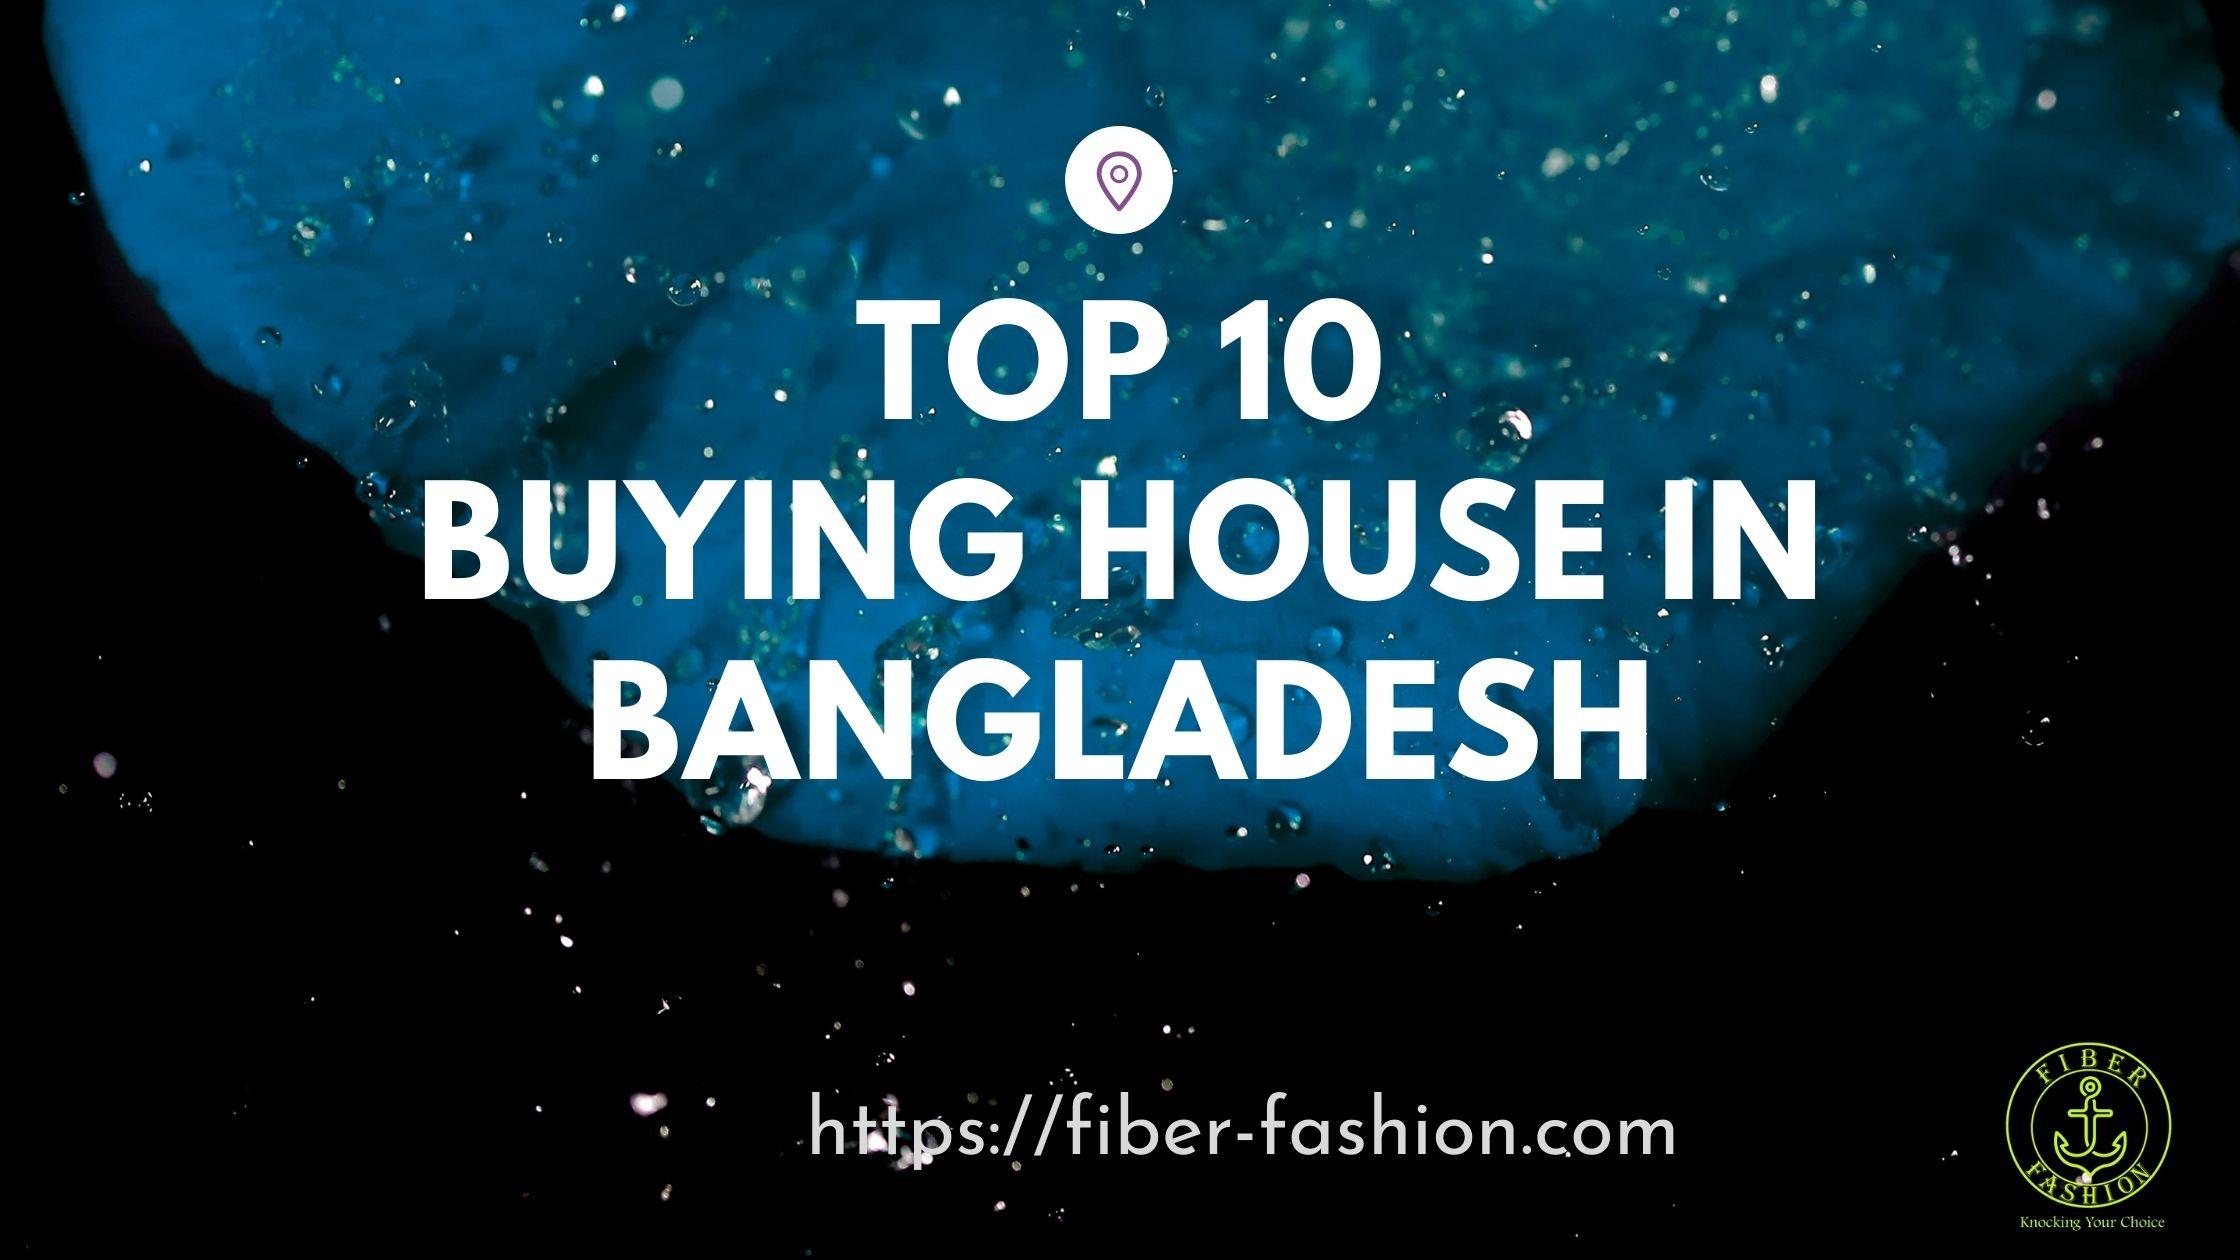 Top 10 buying house in Bangladesh